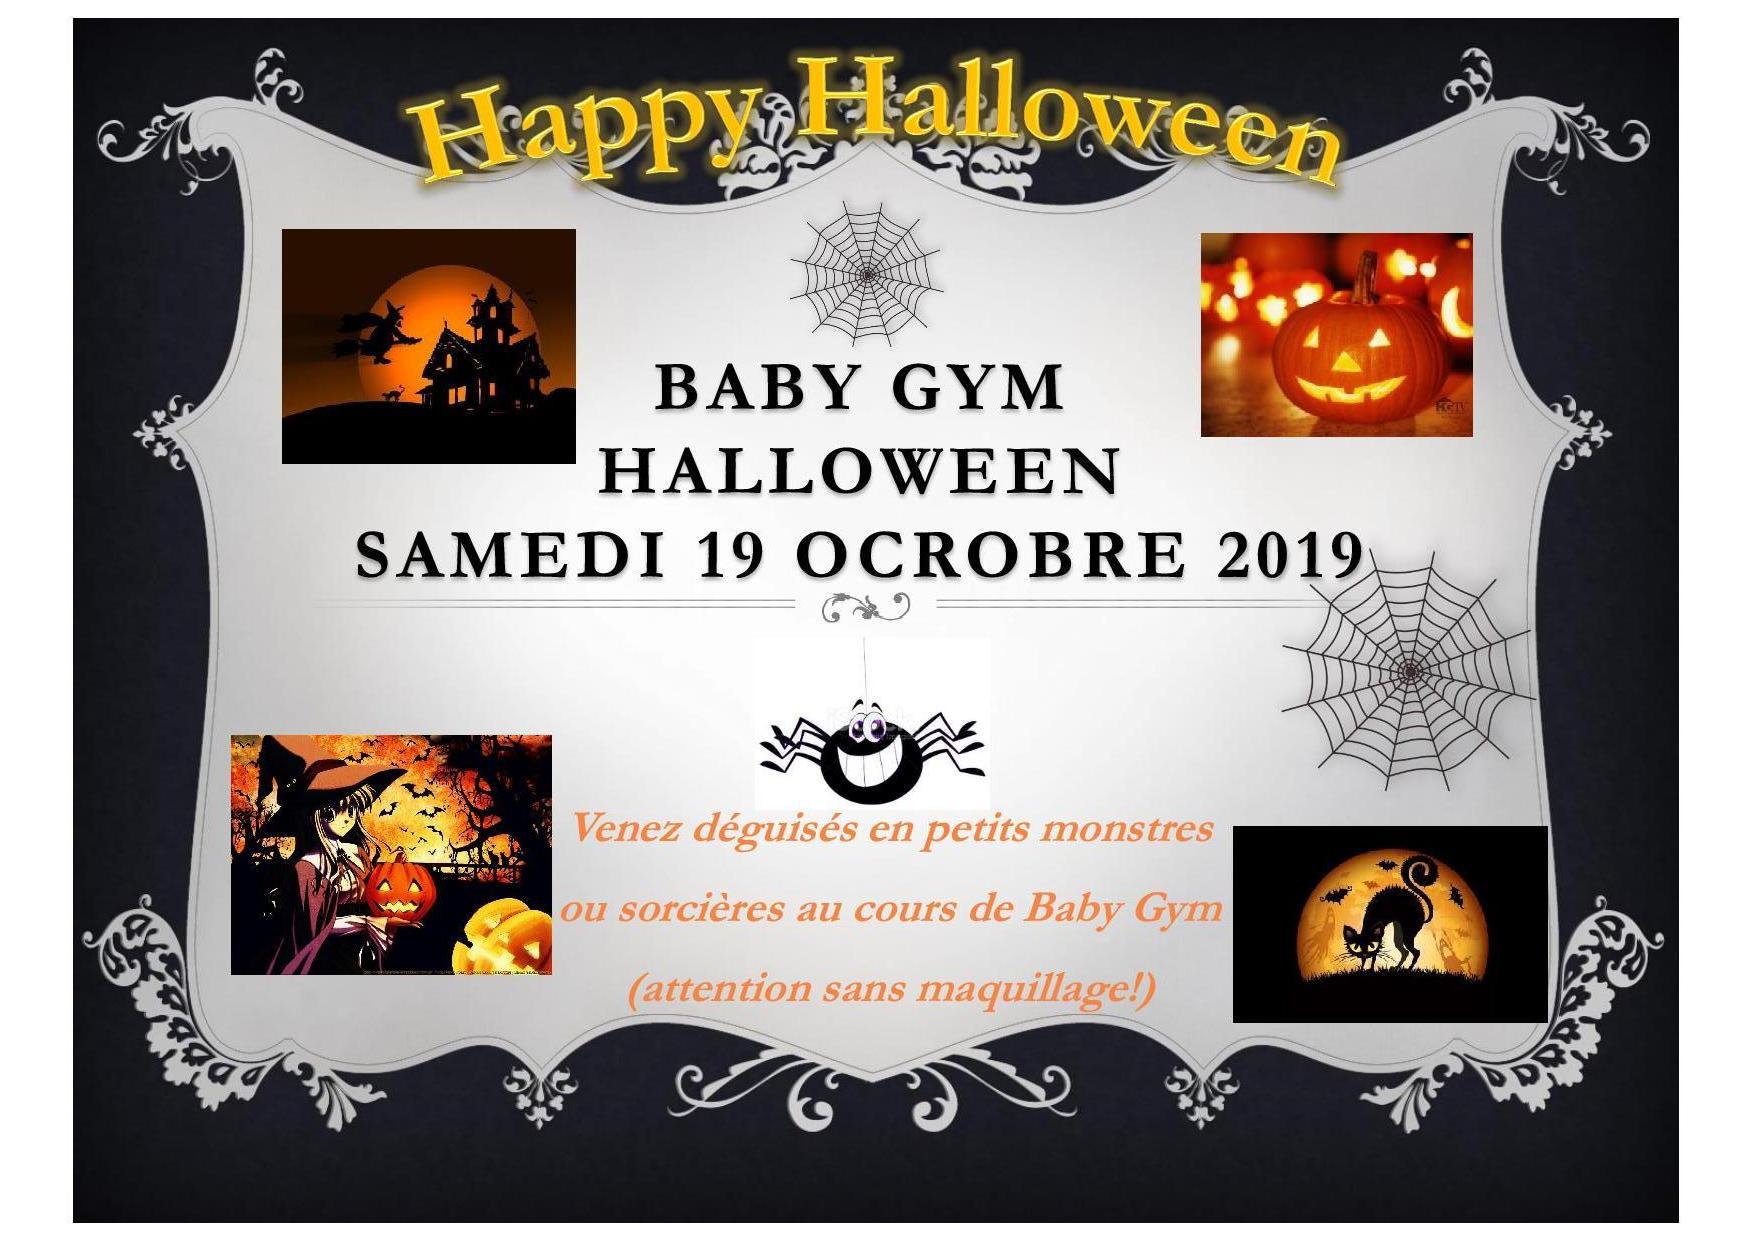 Baby gym halloween samedi 15 octobre